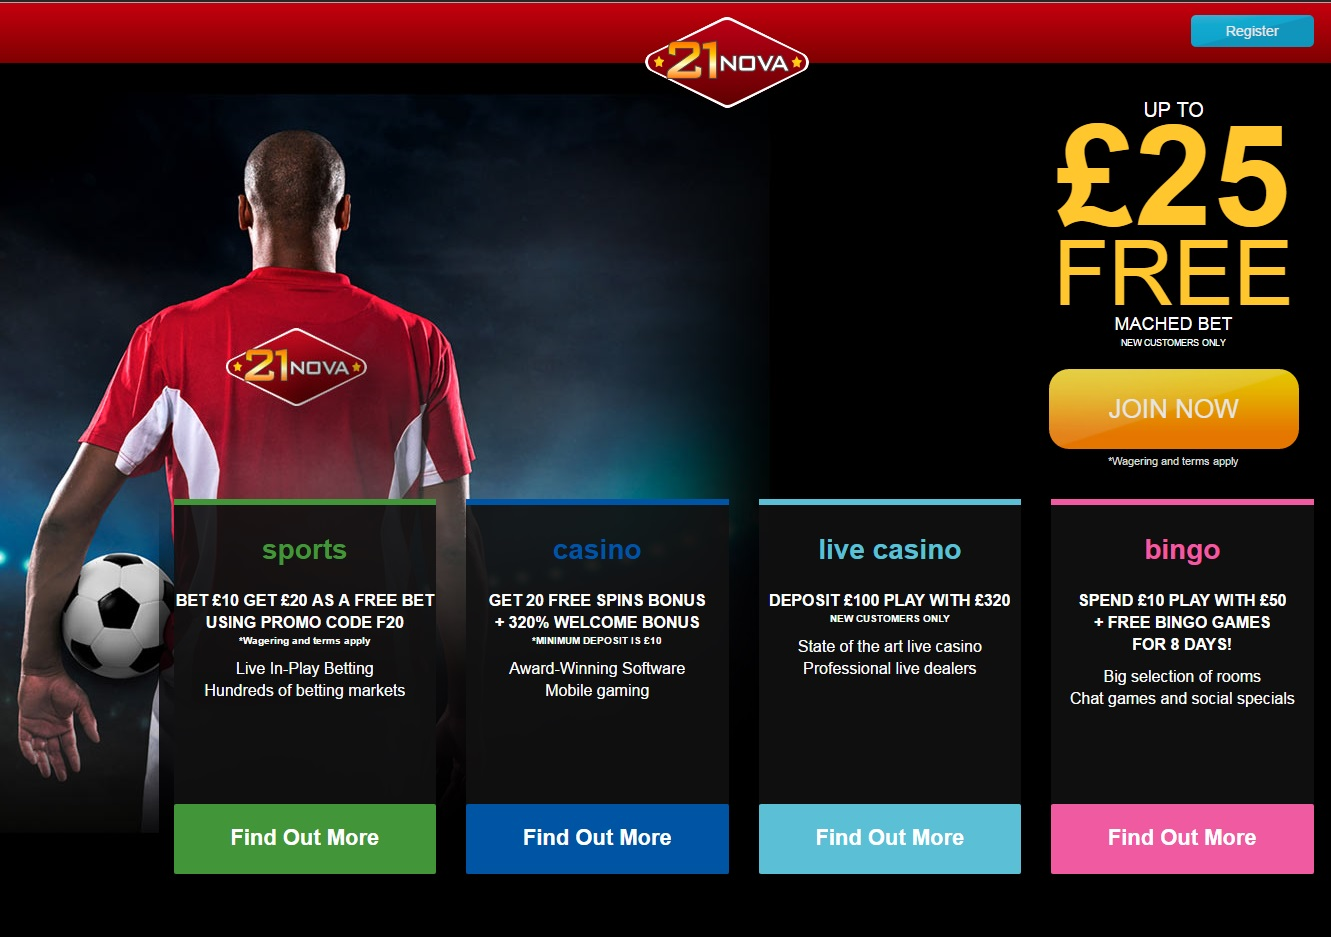 21Nova Casino Launches Sportsbook